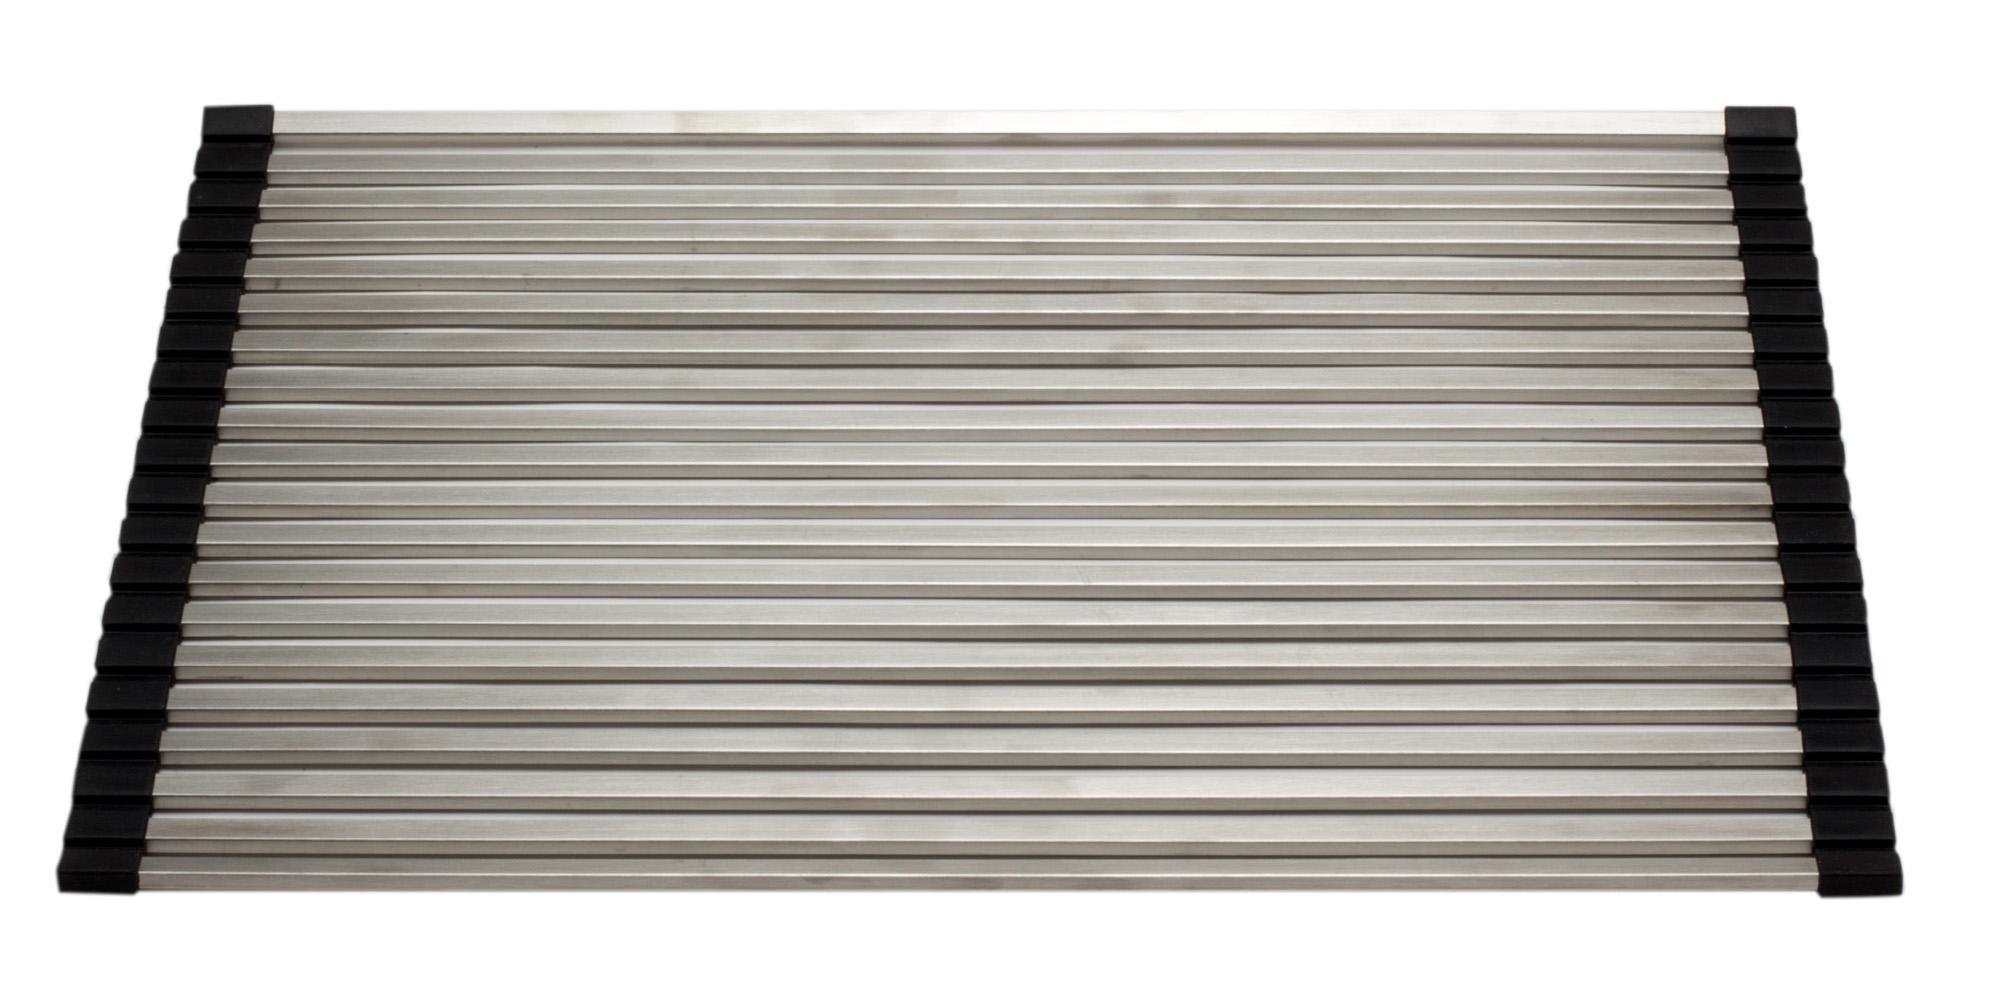 ALFI brand ABDM1813 18 x 13 in. Modern Stainless Steel Drain Mat for Kitchen